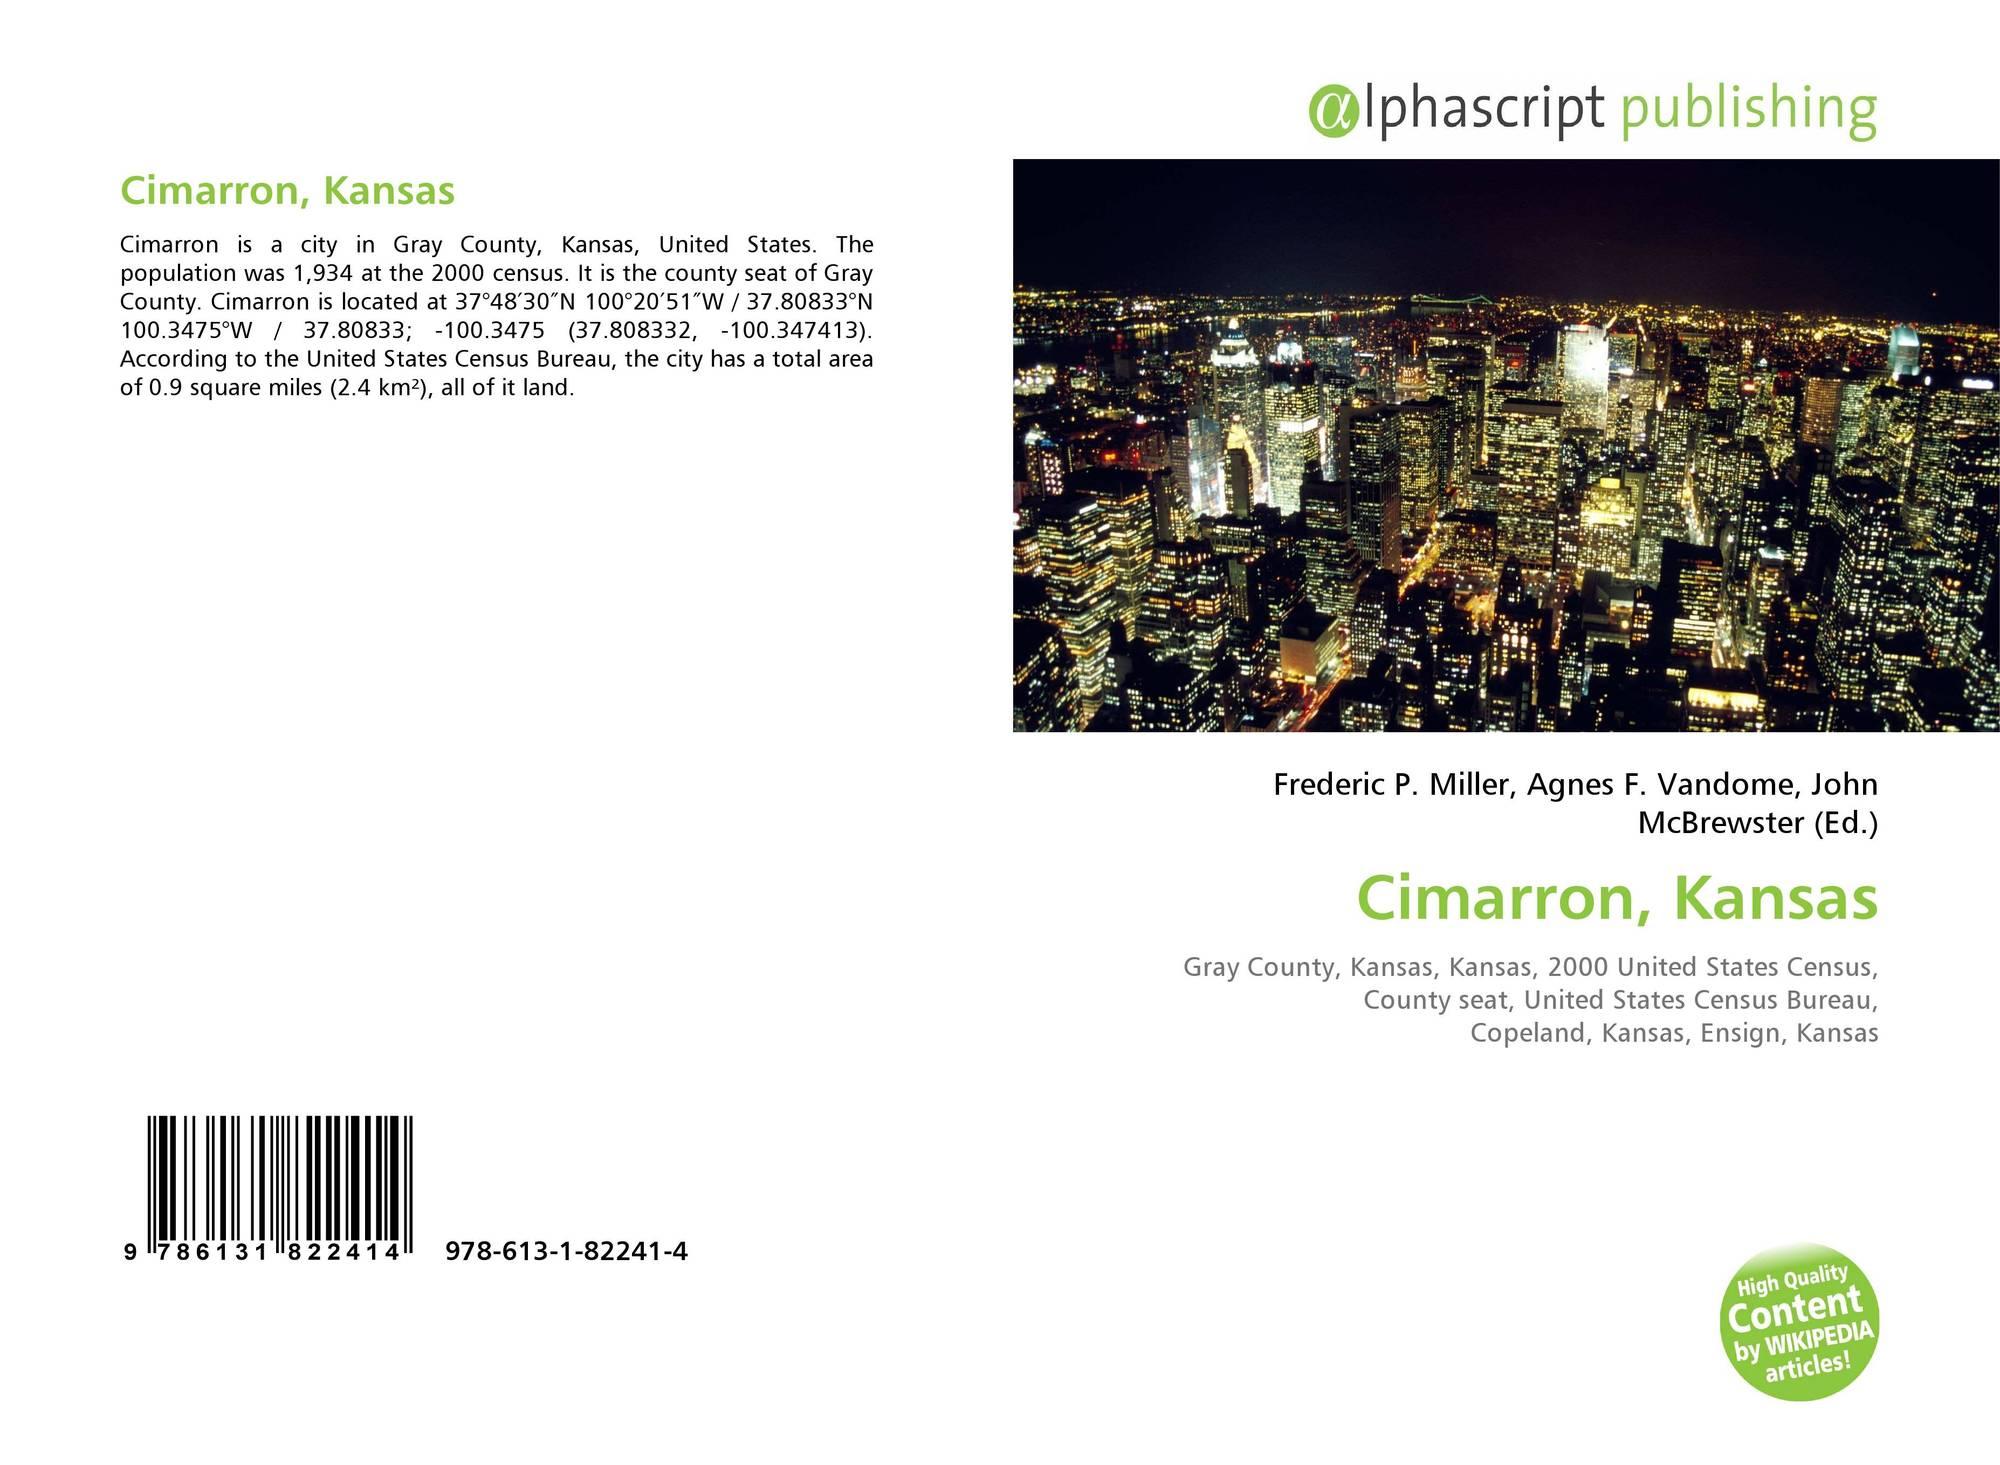 Kansas gray county copeland - Bookcover Of Cimarron Kansas Omni Badge 9307e2201e5f762643a64561af3456be64a87707602f96b92ef18a9bbcada116